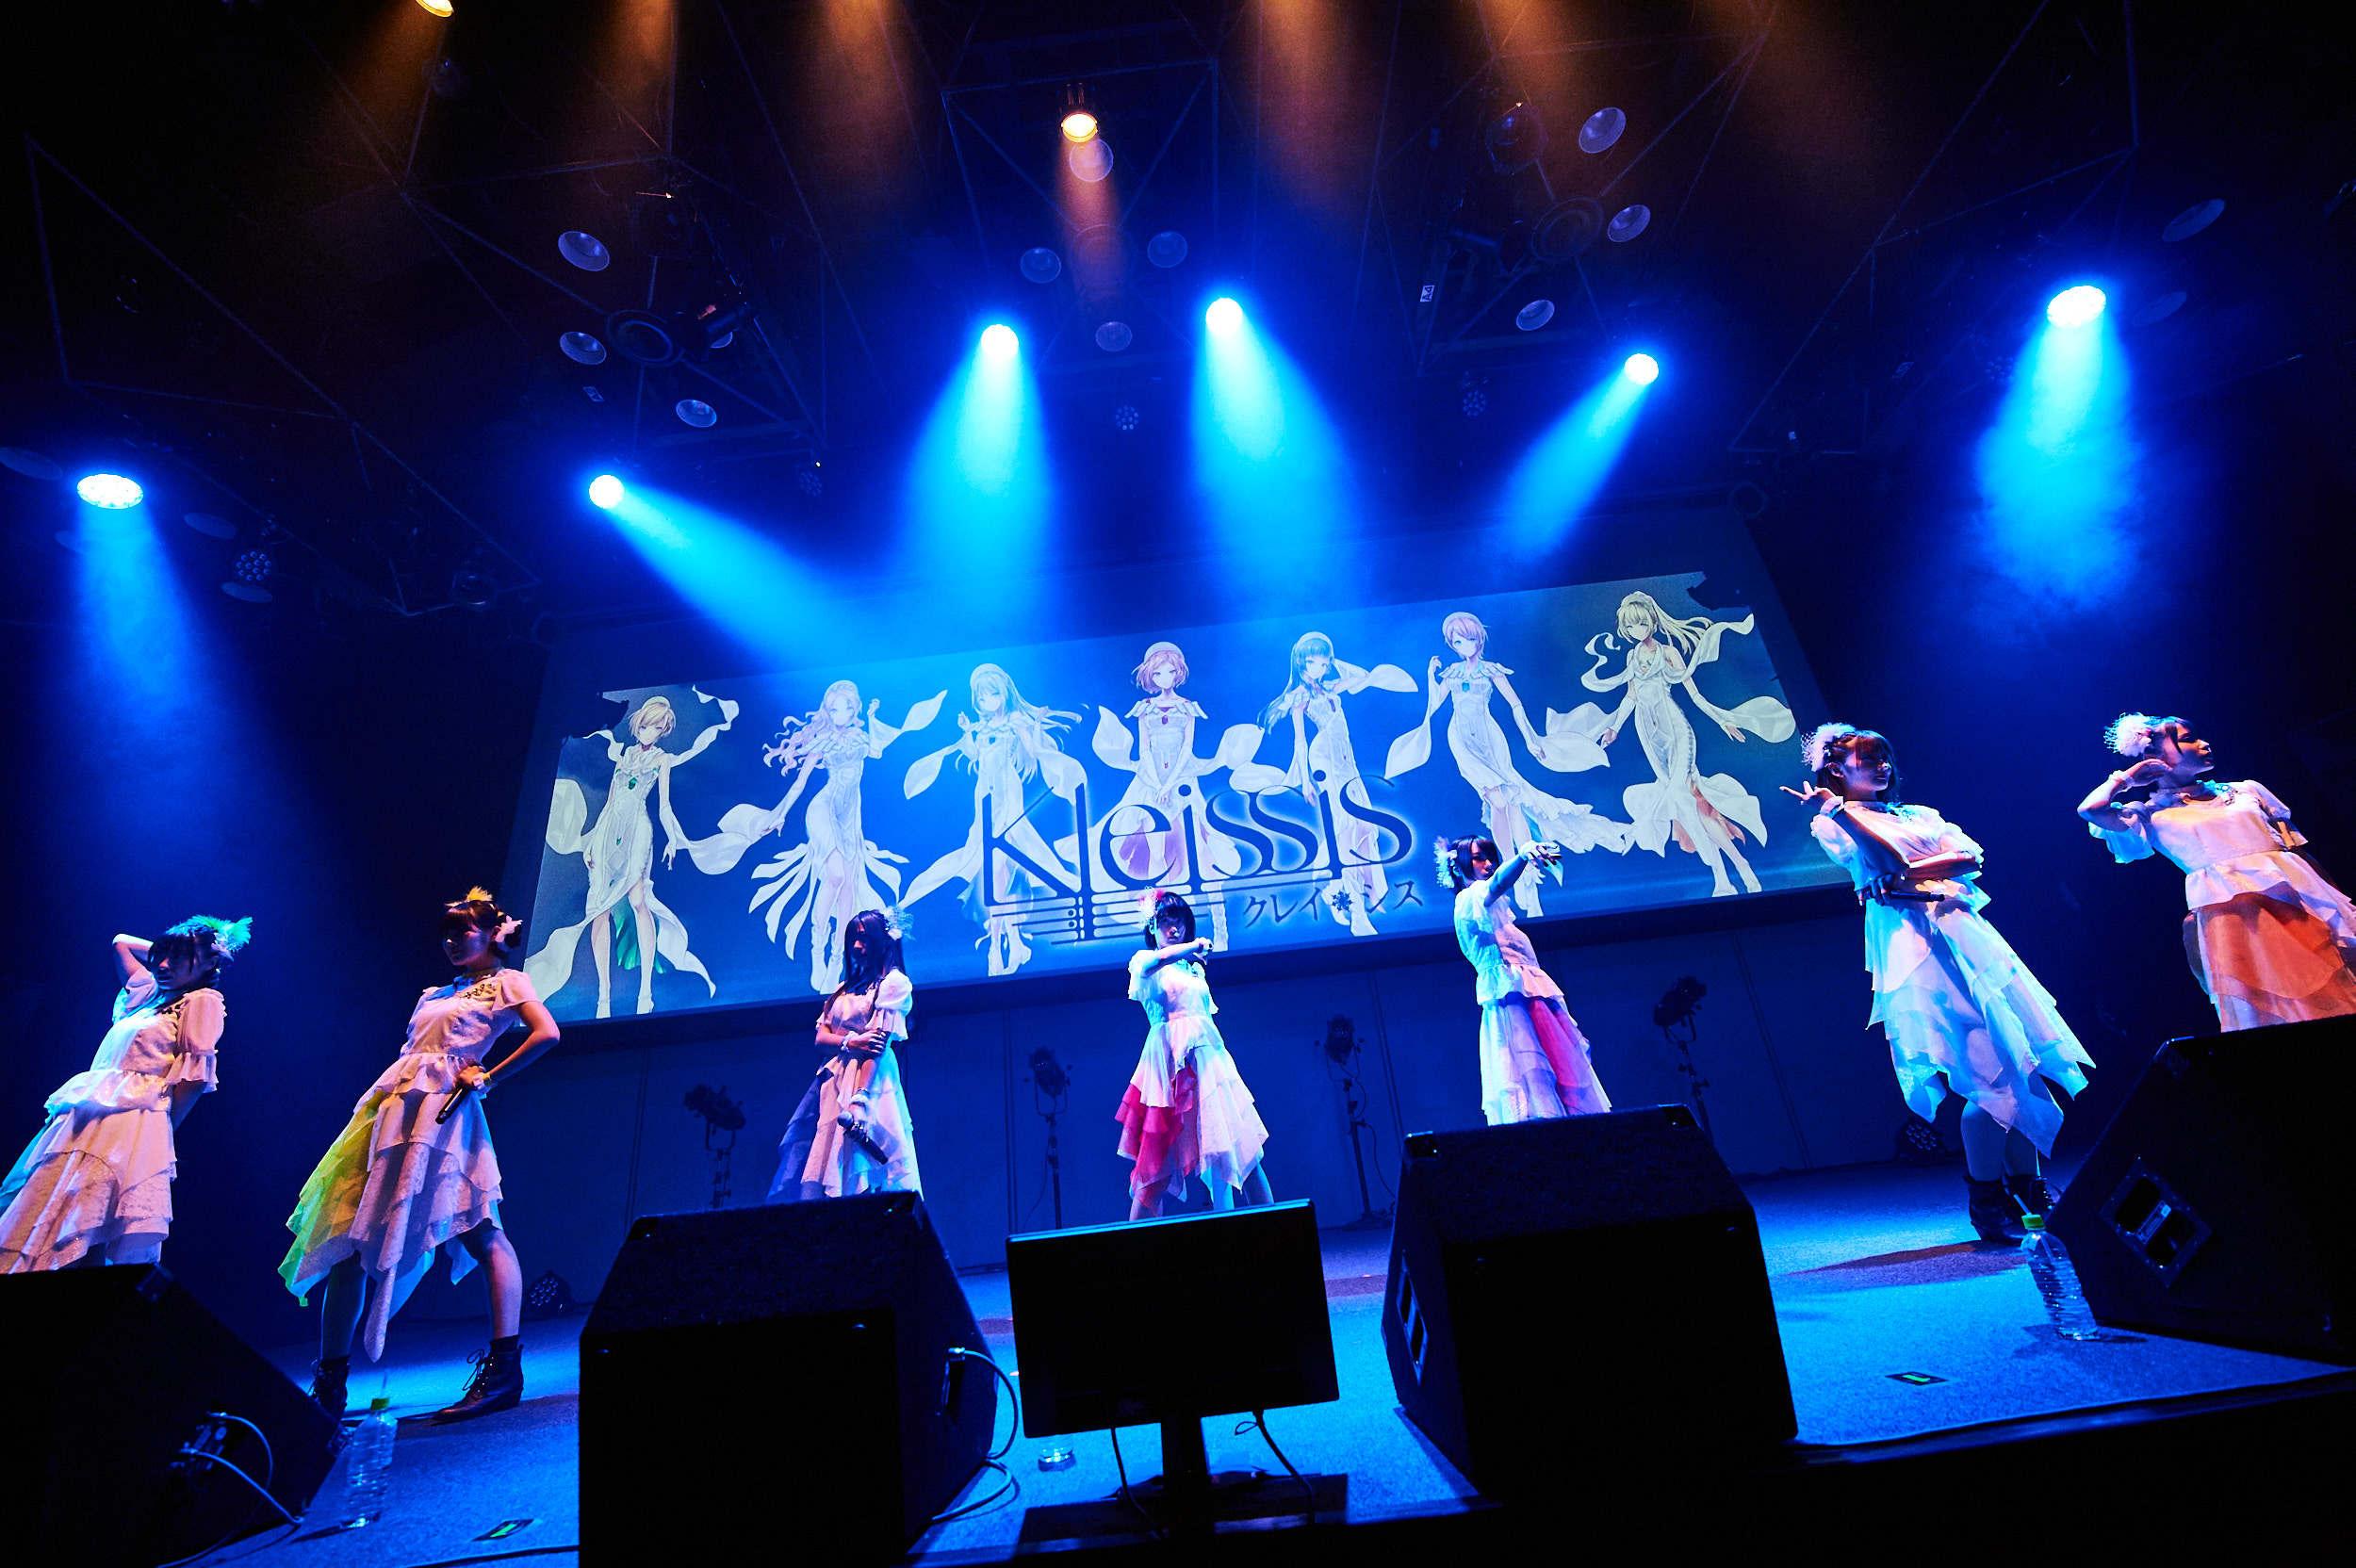 『Kleissis 1st LIVE~volare(ヴォラーレ)~』ライブ写真